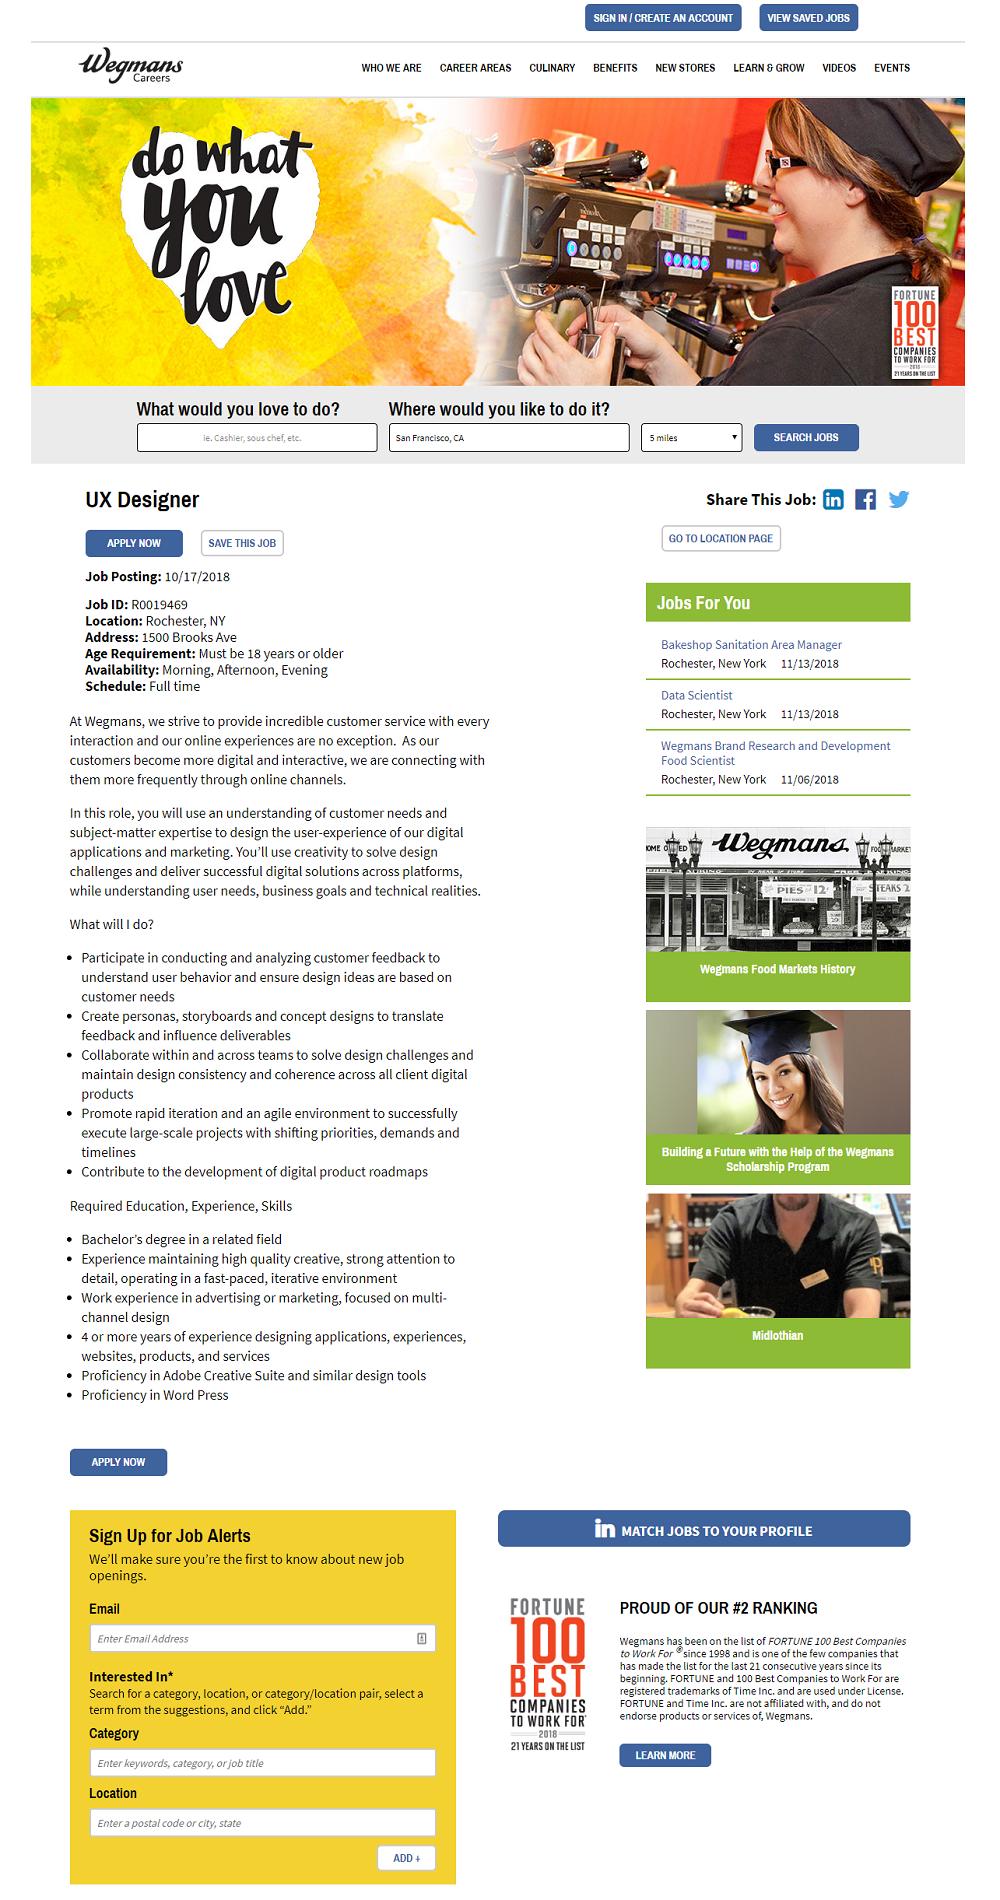 Wegmans job description